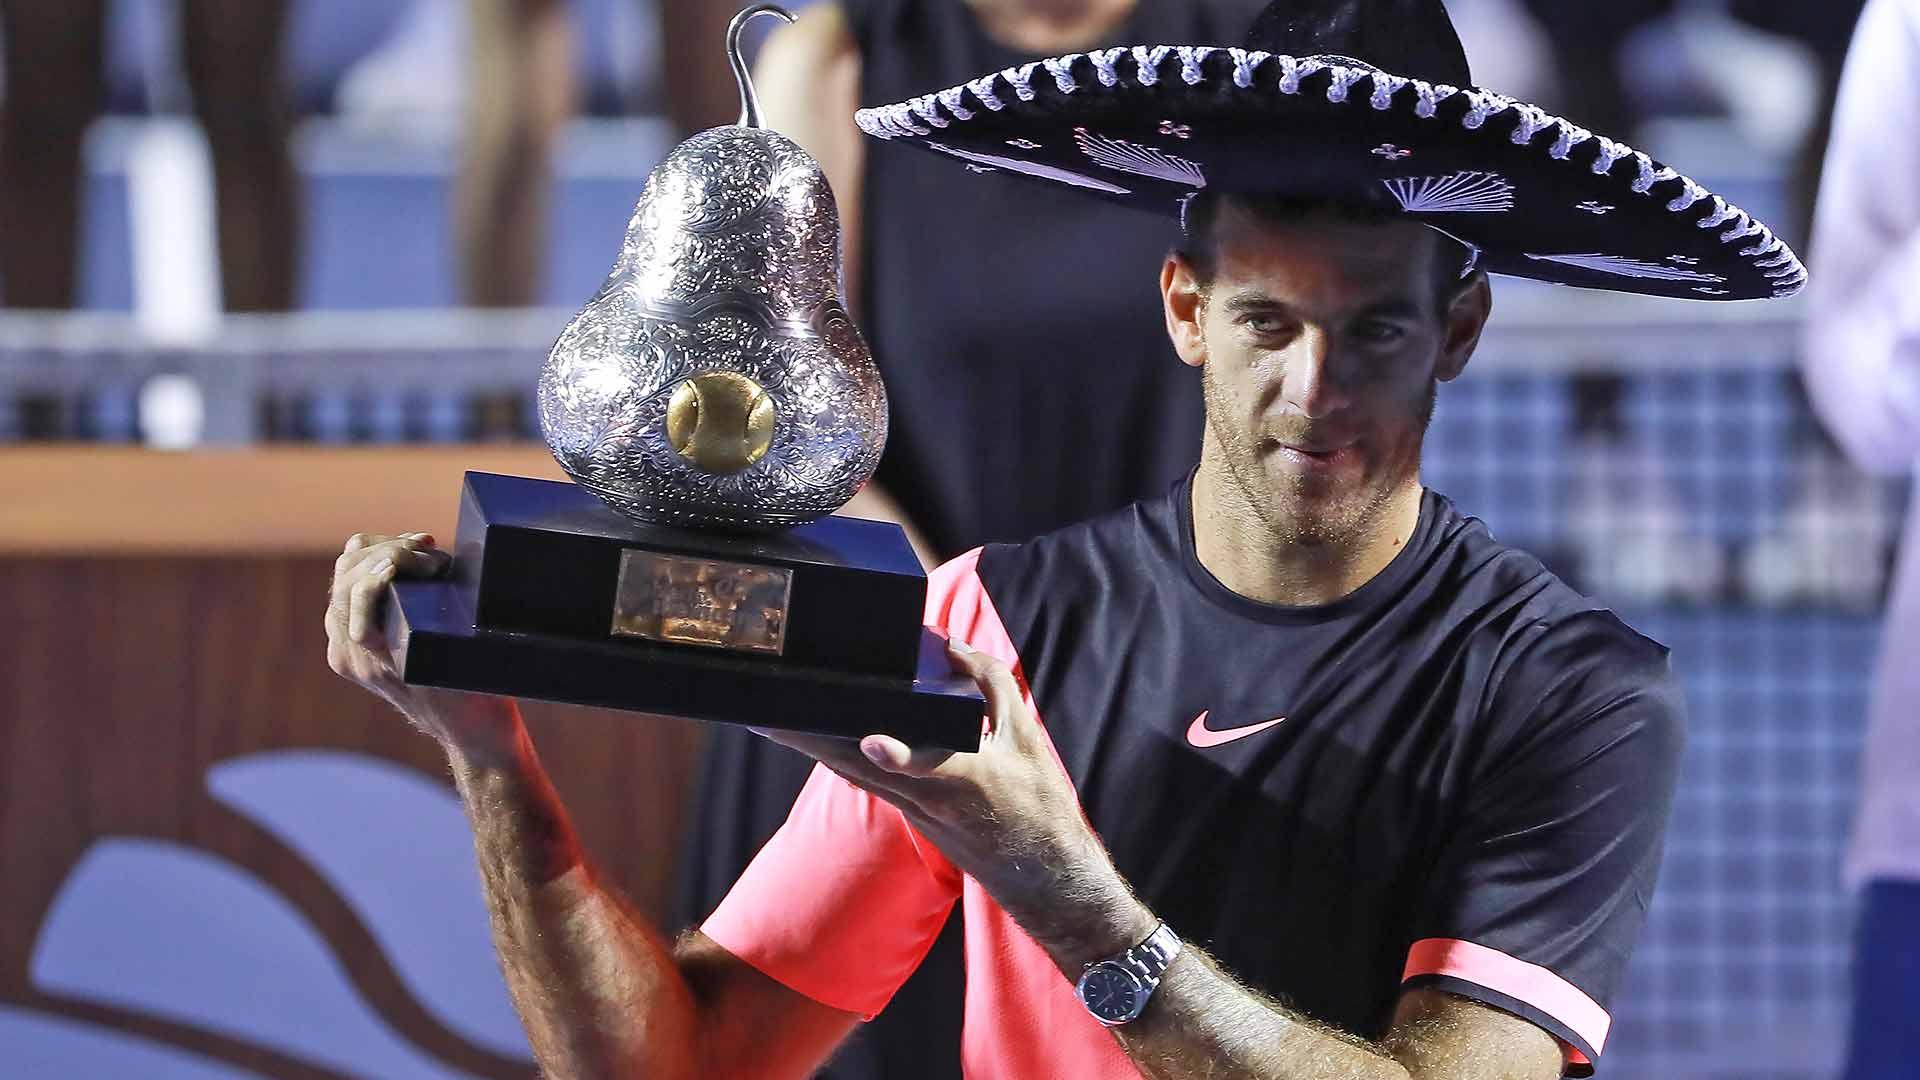 Delpo Hoists Biggest Trophy In Years